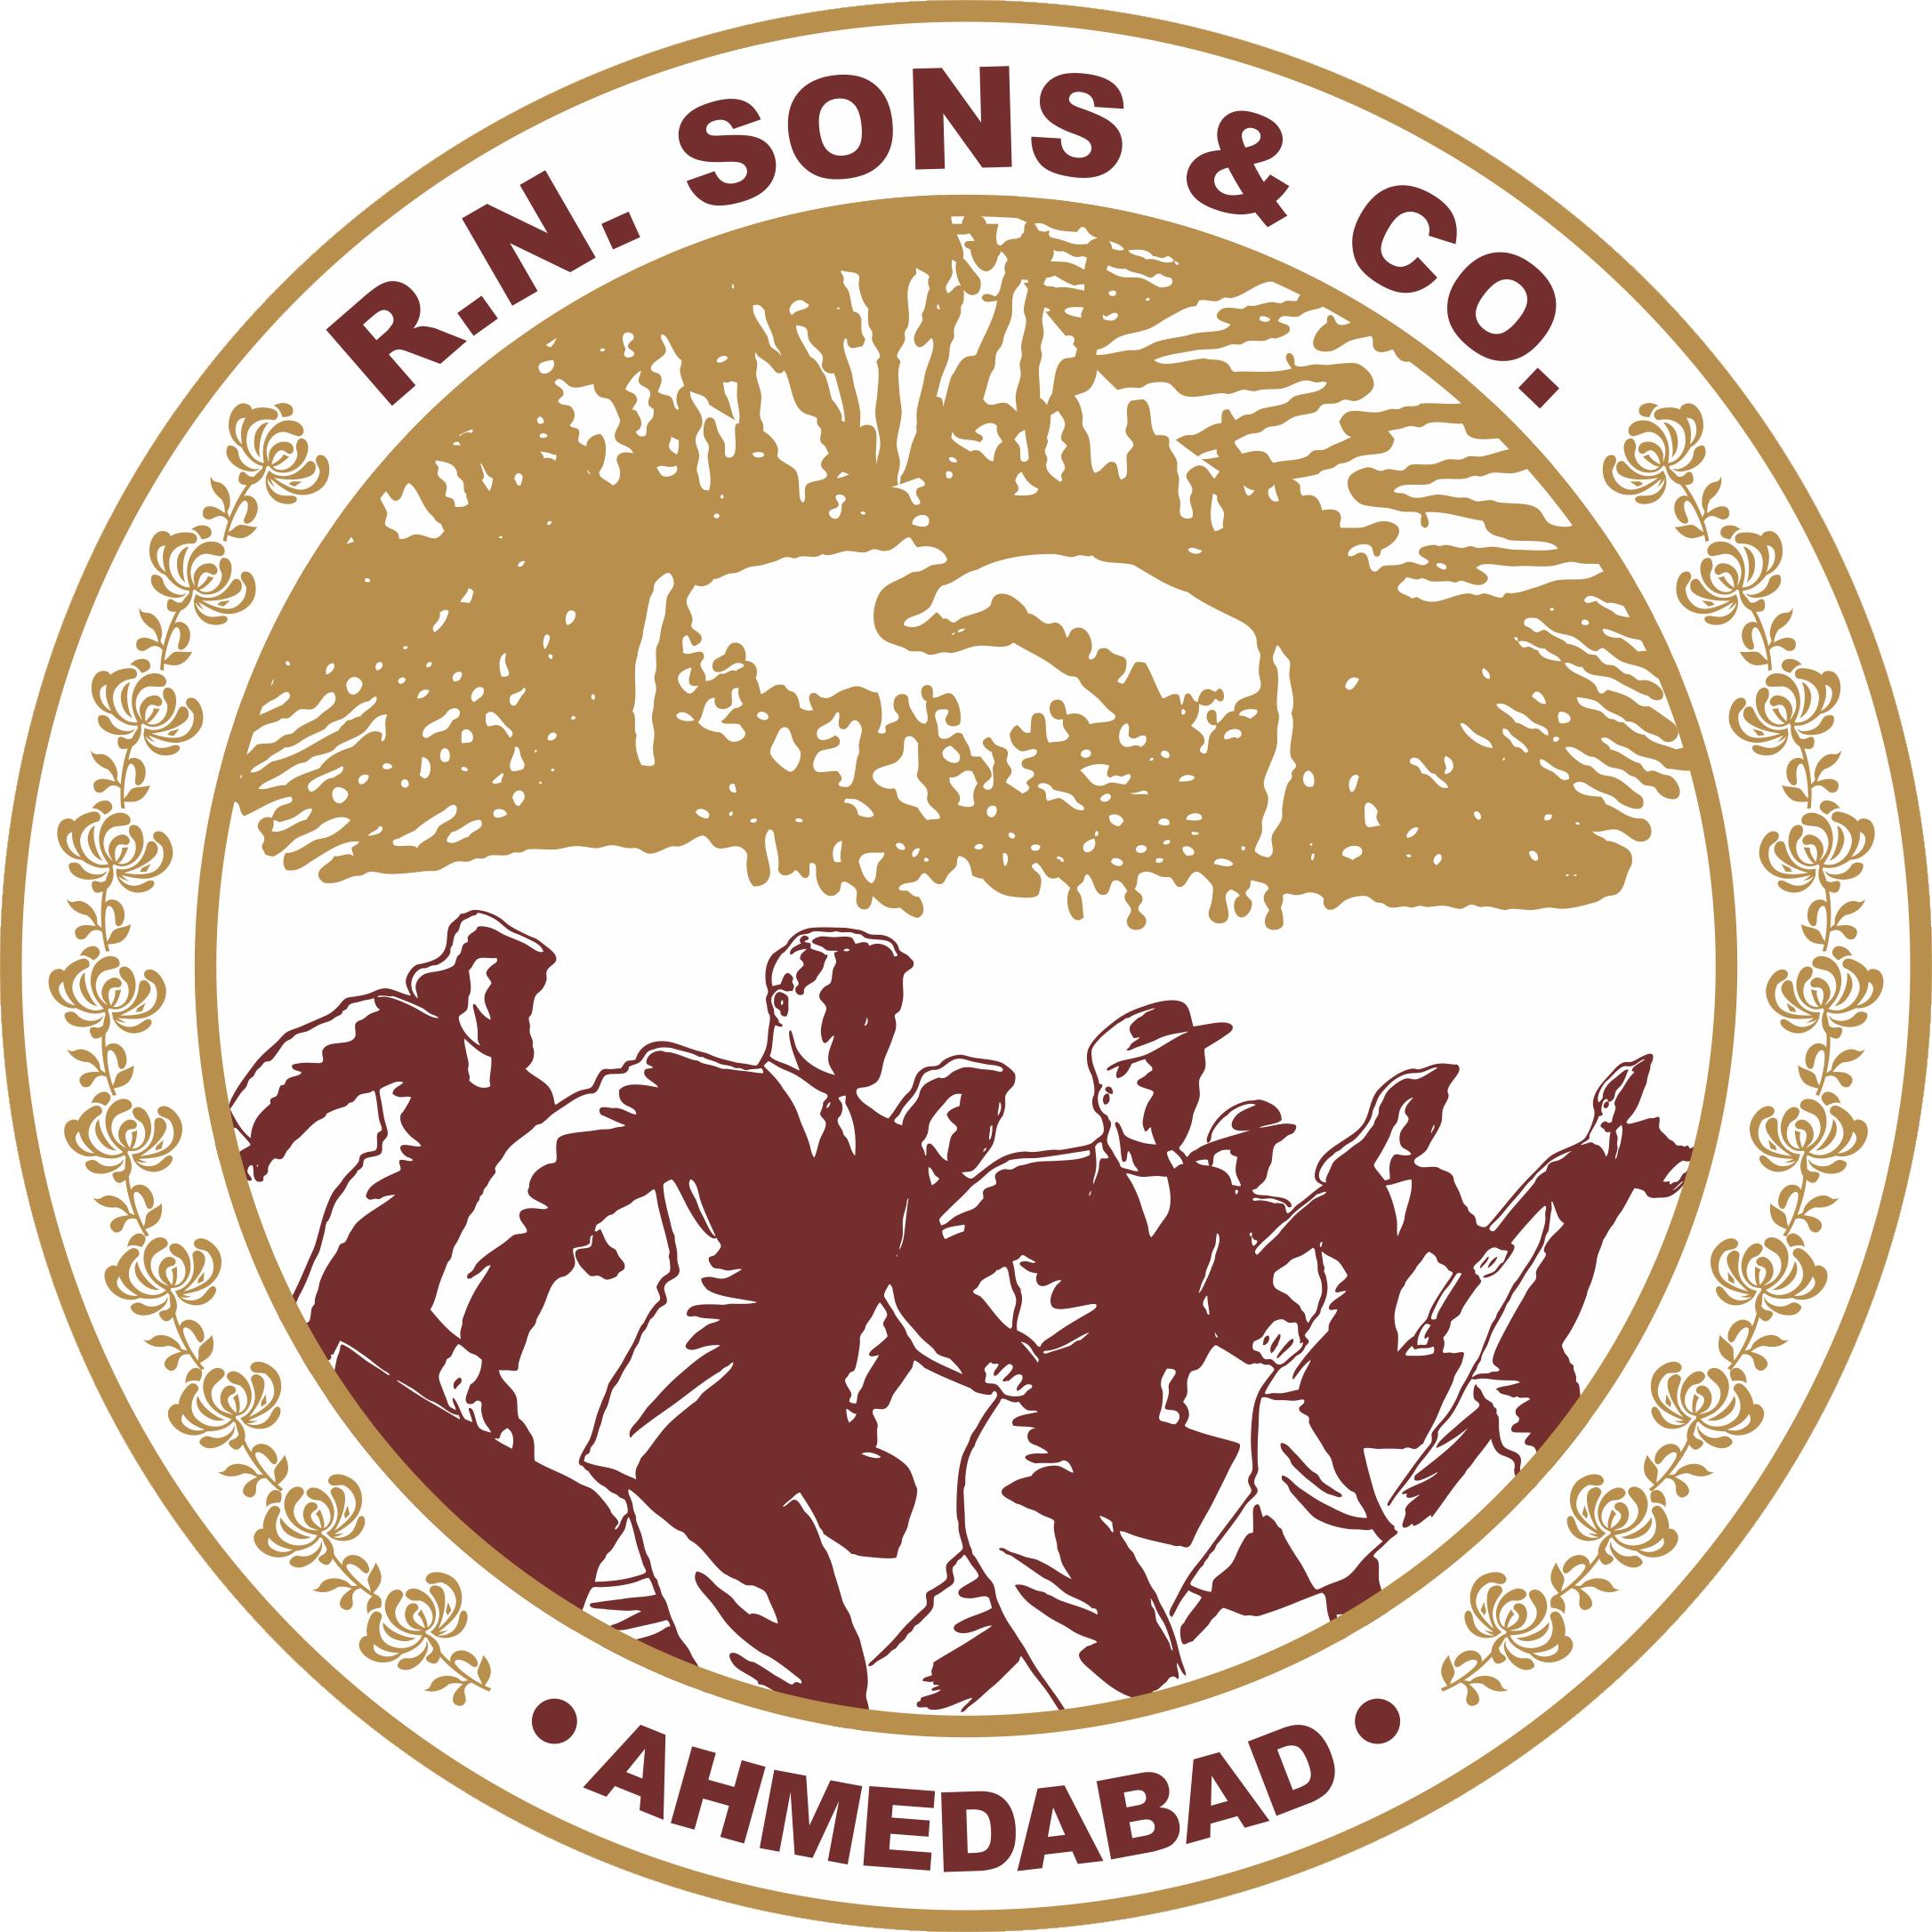 R. N. Sons & Co.